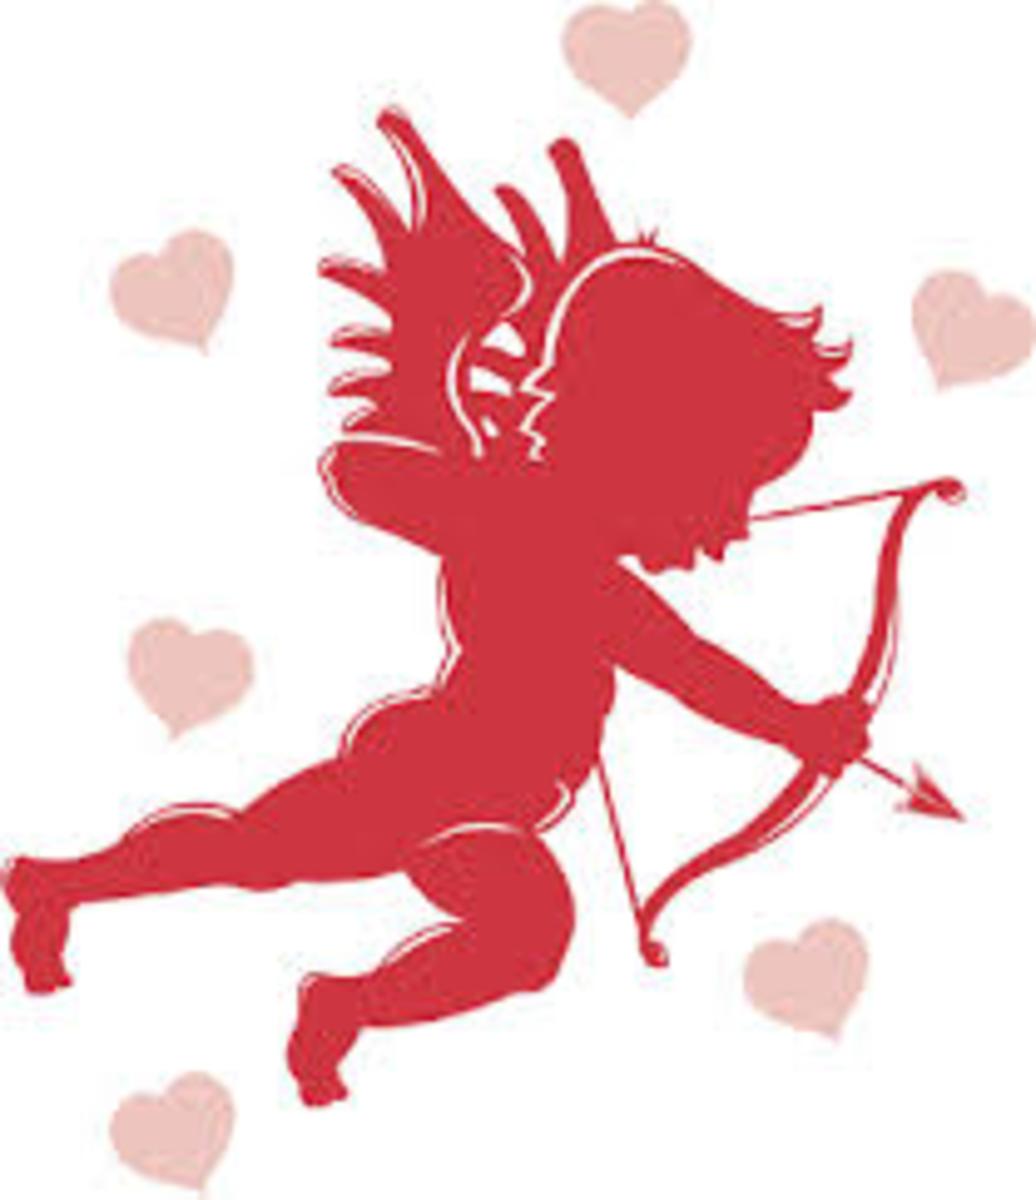 is-it-love-10-signs-its-true-love